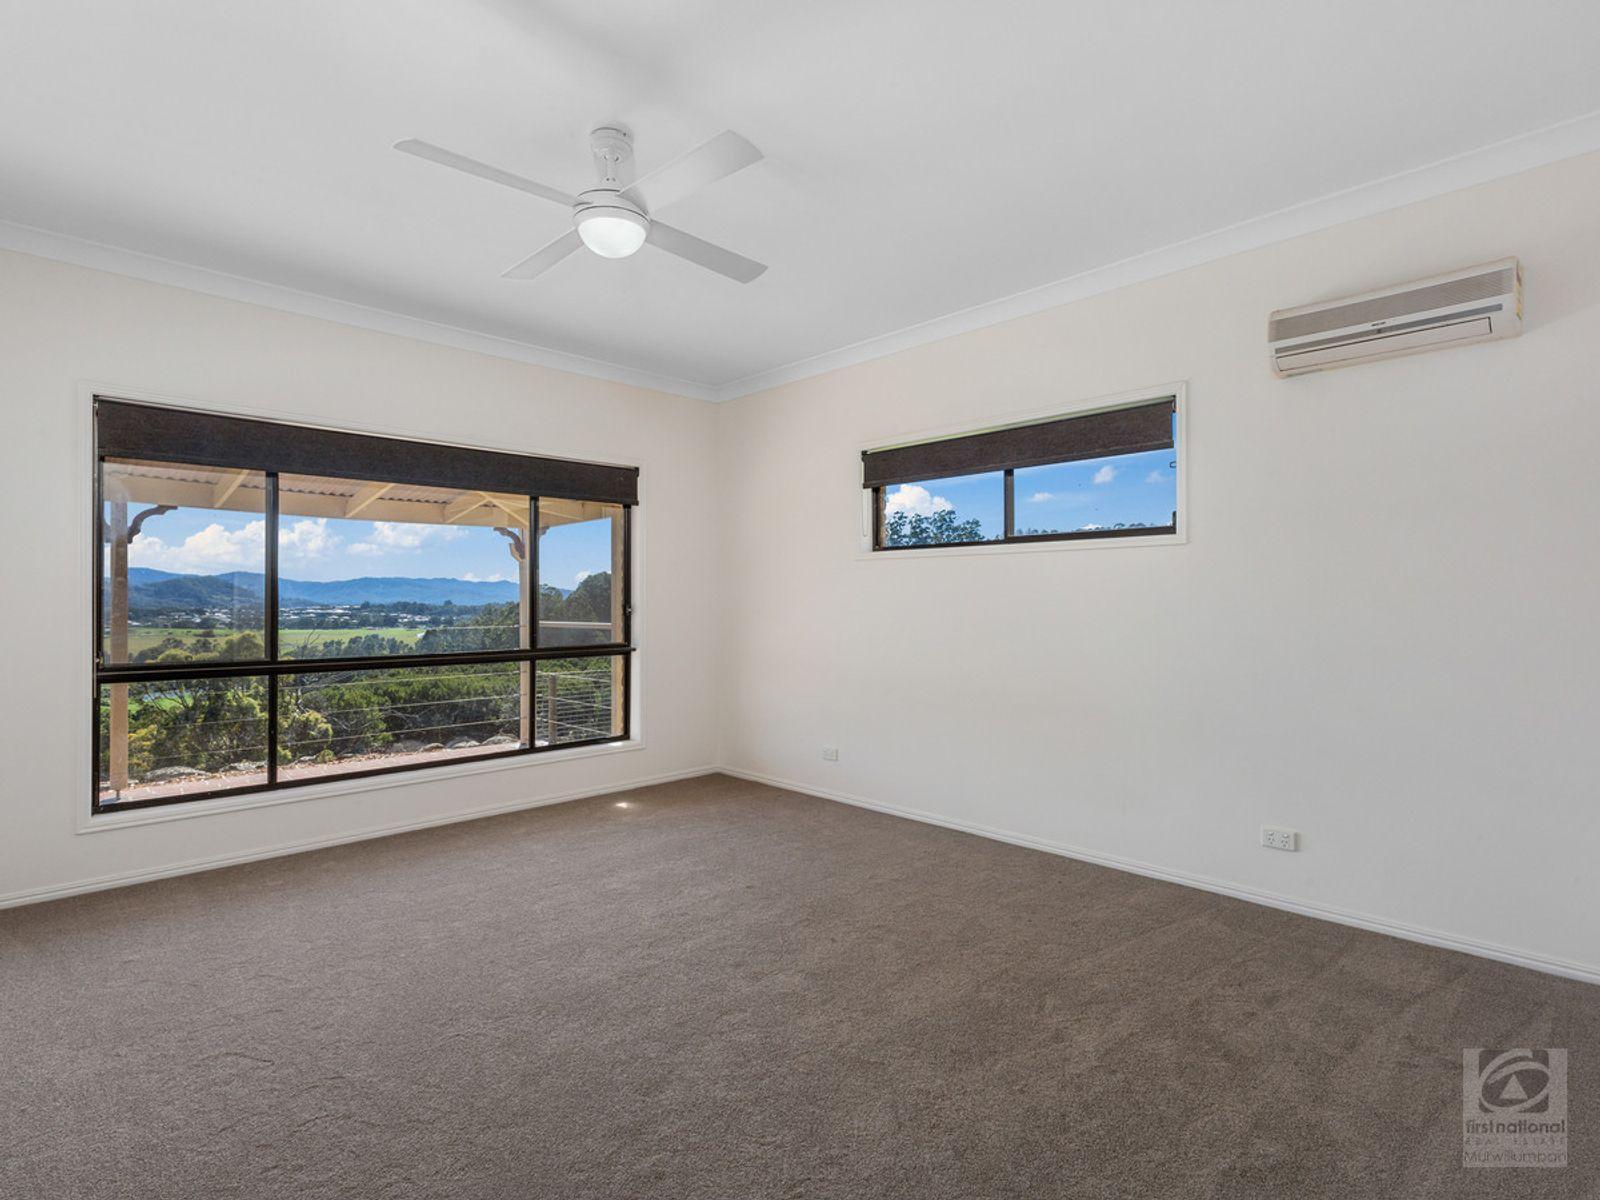 671 Kyogle Road, Byangum, NSW 2484